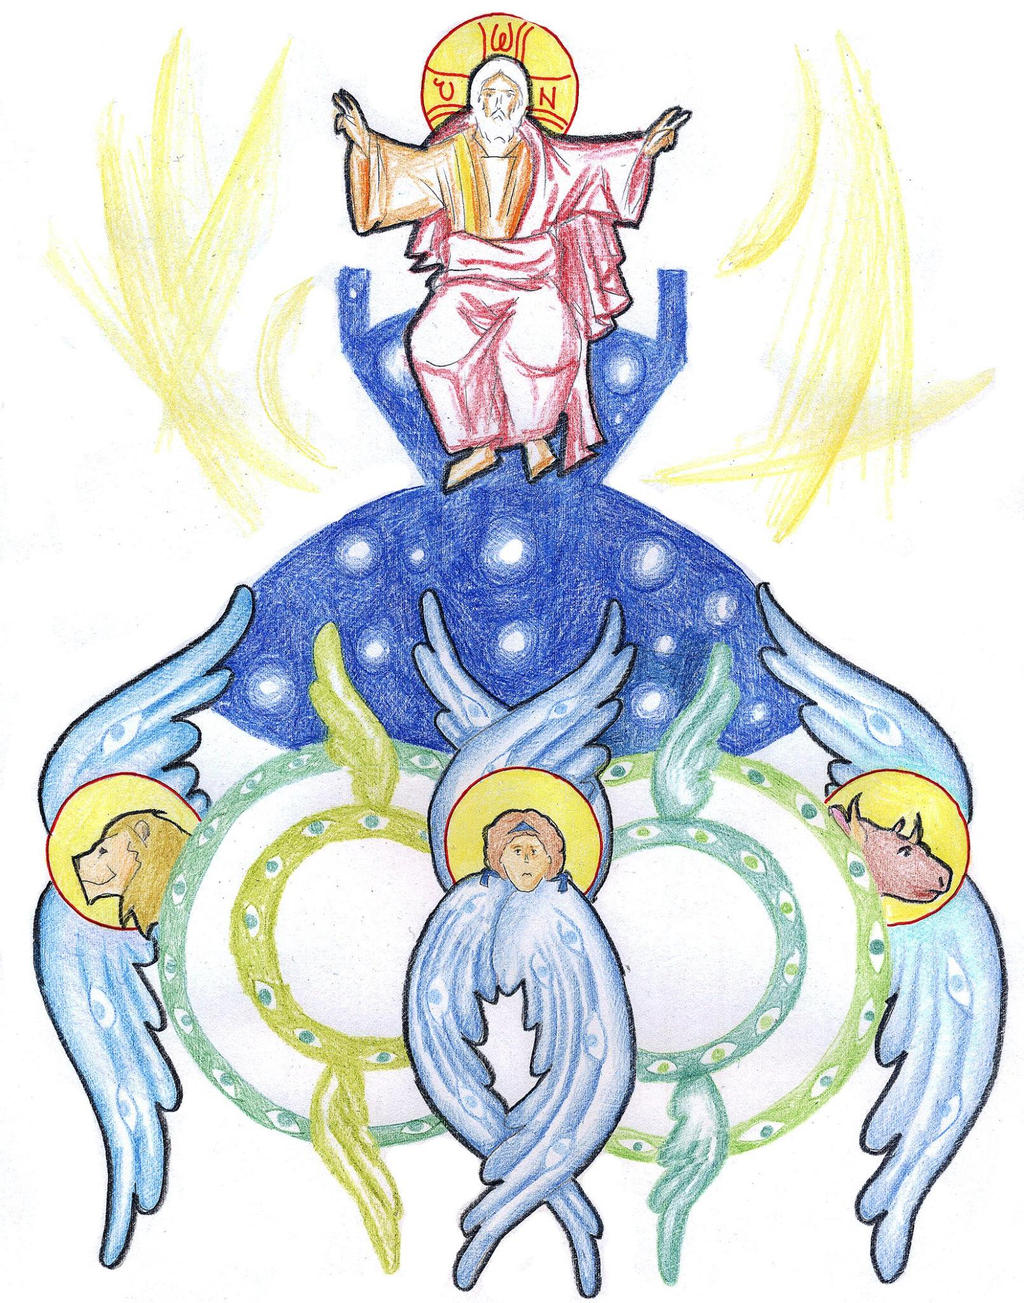 Ezekiel 1:22-28 (The Man on the Throne) by Parastos